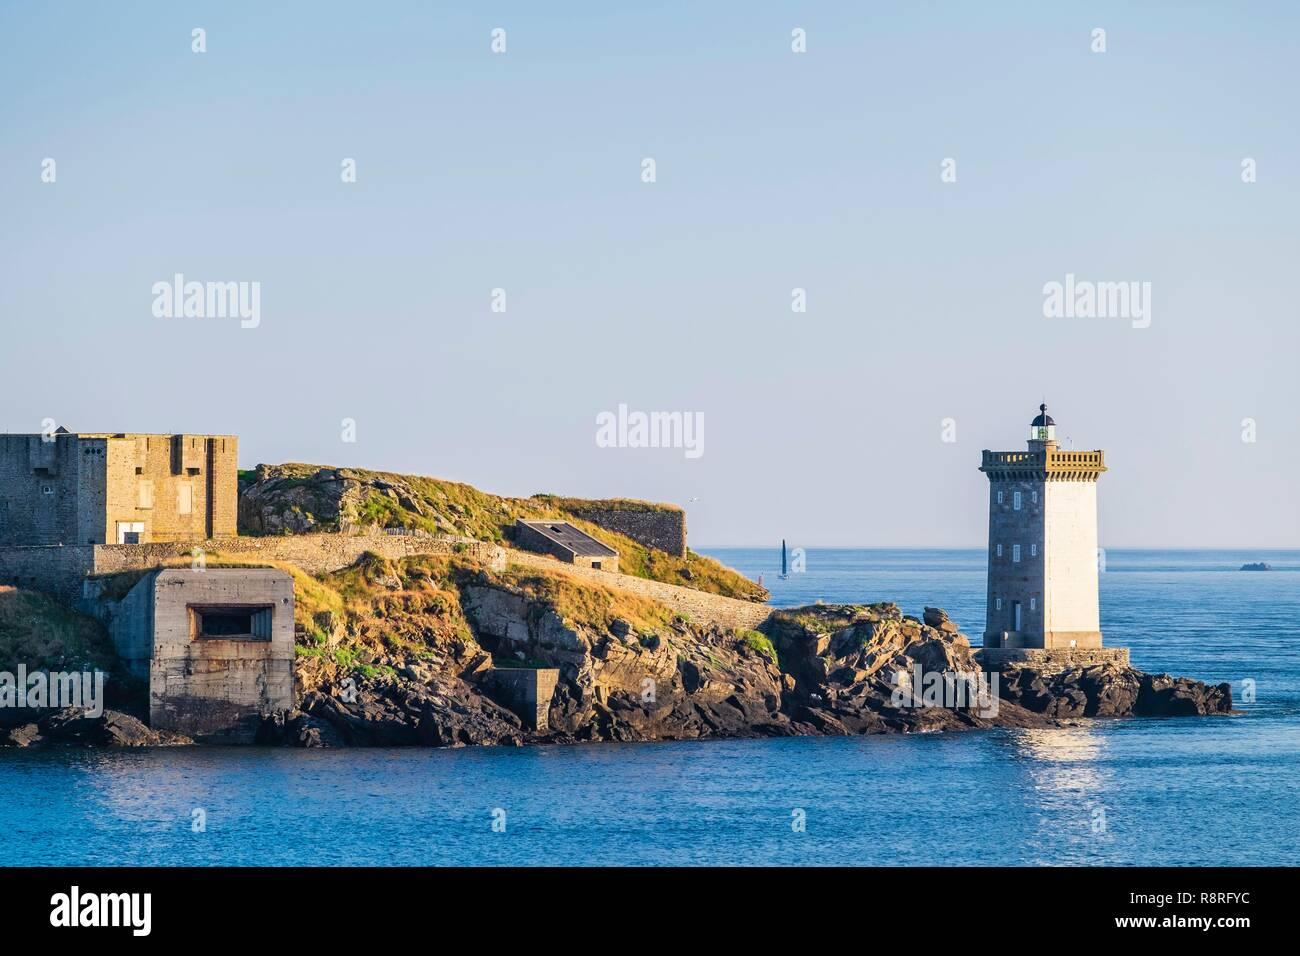 France, Finistere, Le Conquet, Kermorvan peninsula, Kermorvan lighthouse built in 1849 Stock Photo